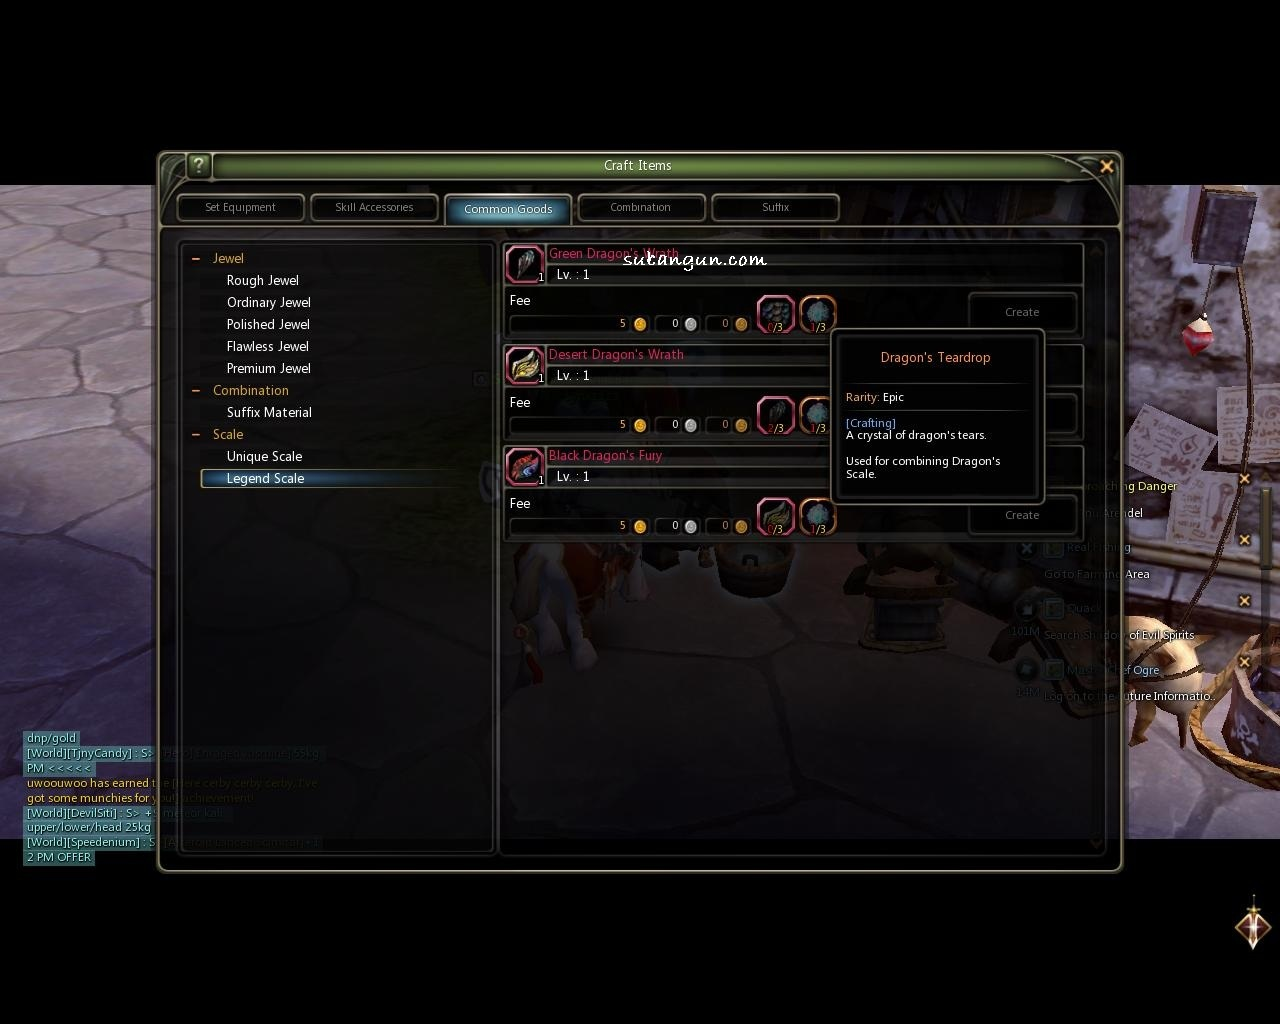 Dragon nest indonesia update loffy di cap 70 berarti cap 80 sudah dekat?